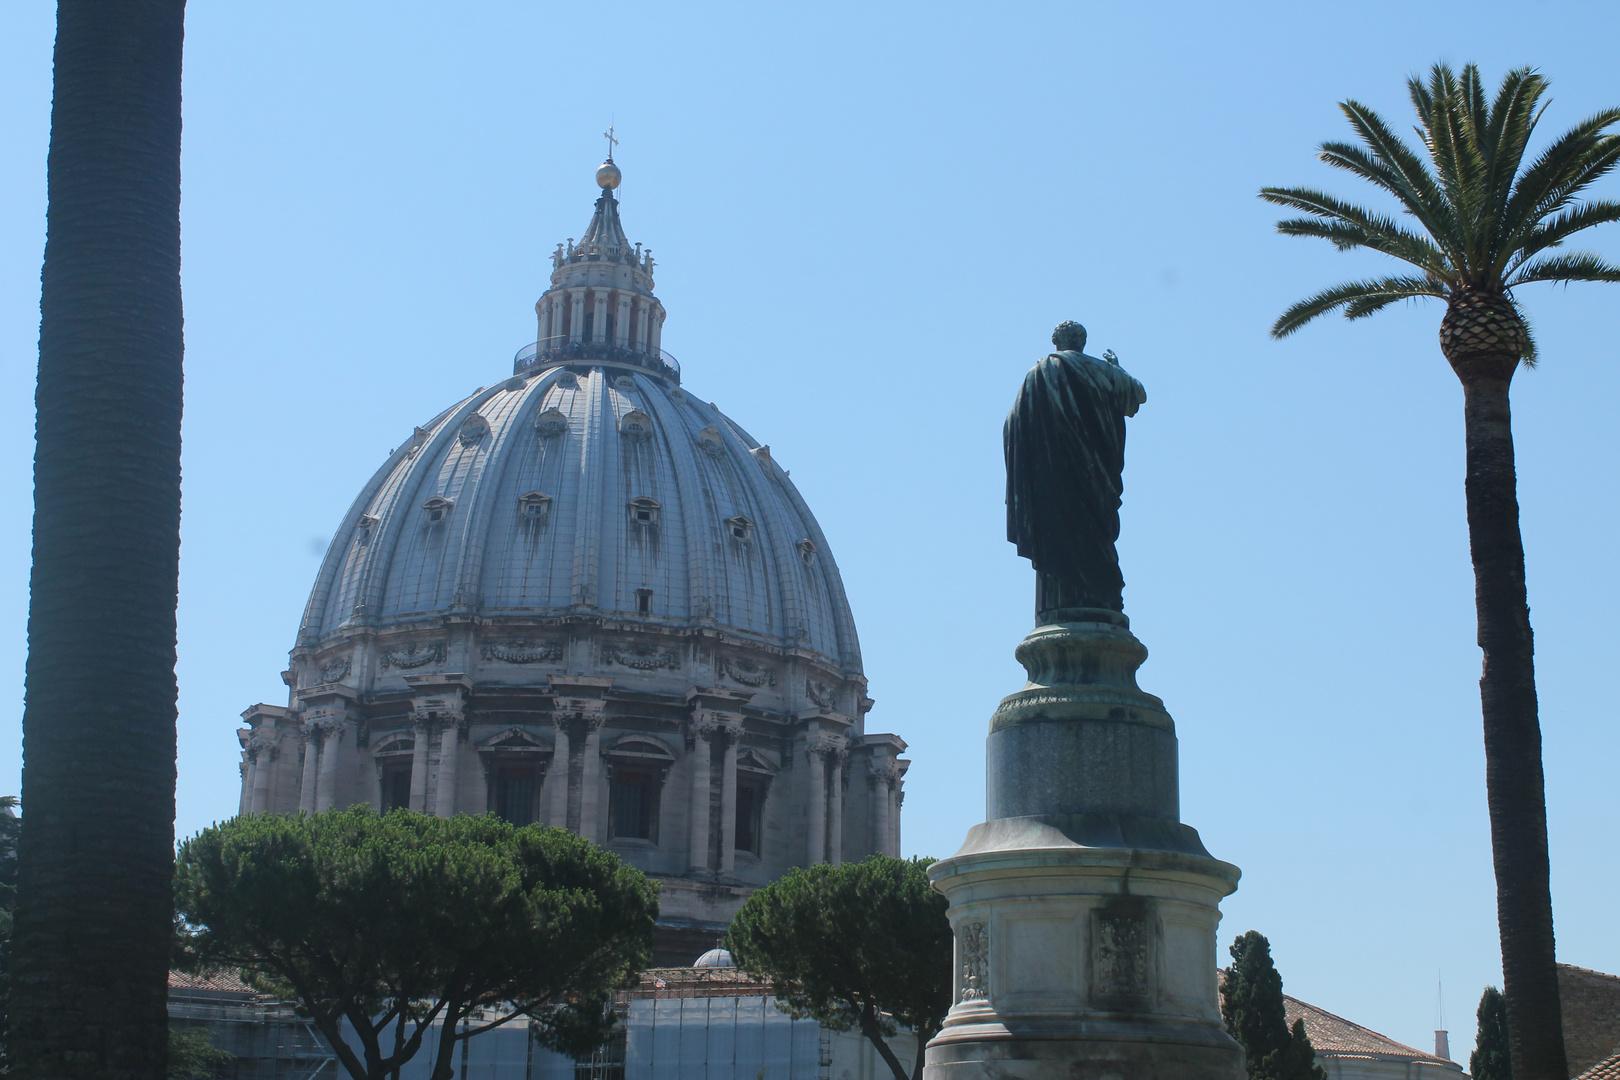 St.Peter looking